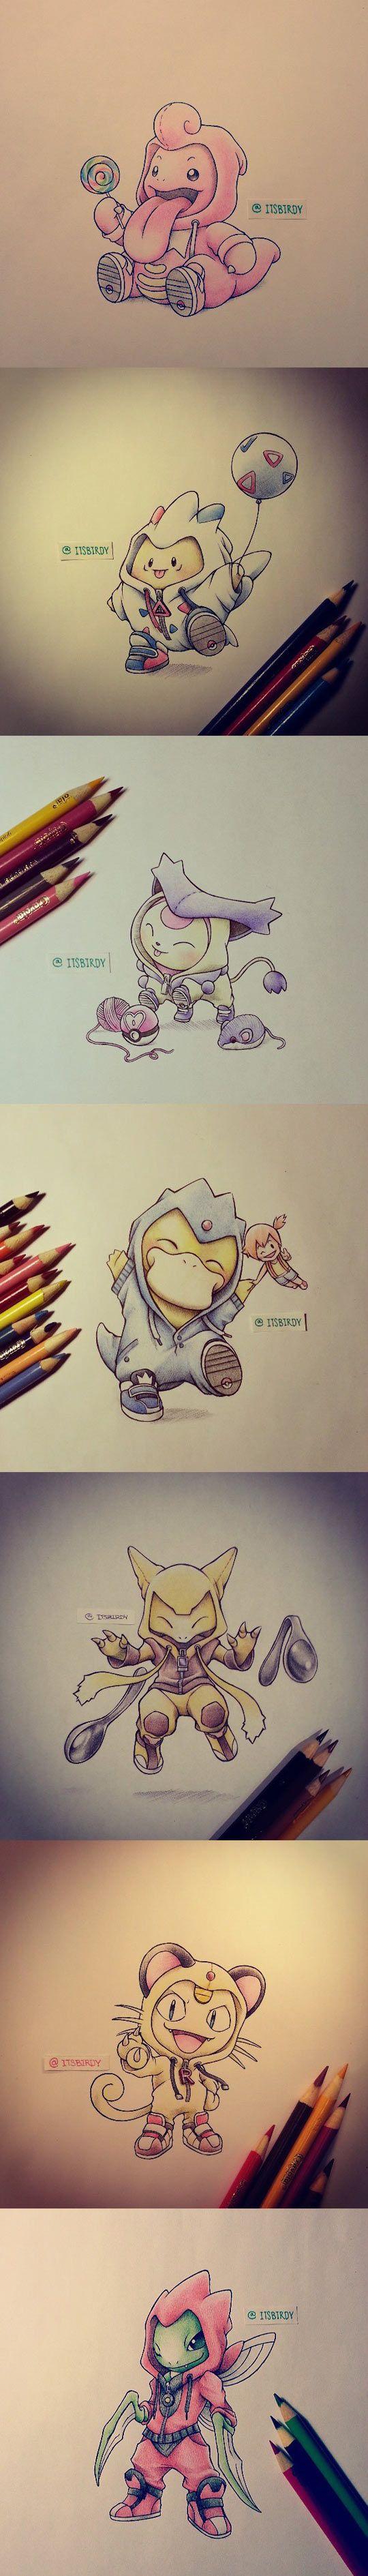 pokemon wearing evolution | Pokemon wearing evolution costumes... - The Meta Picture